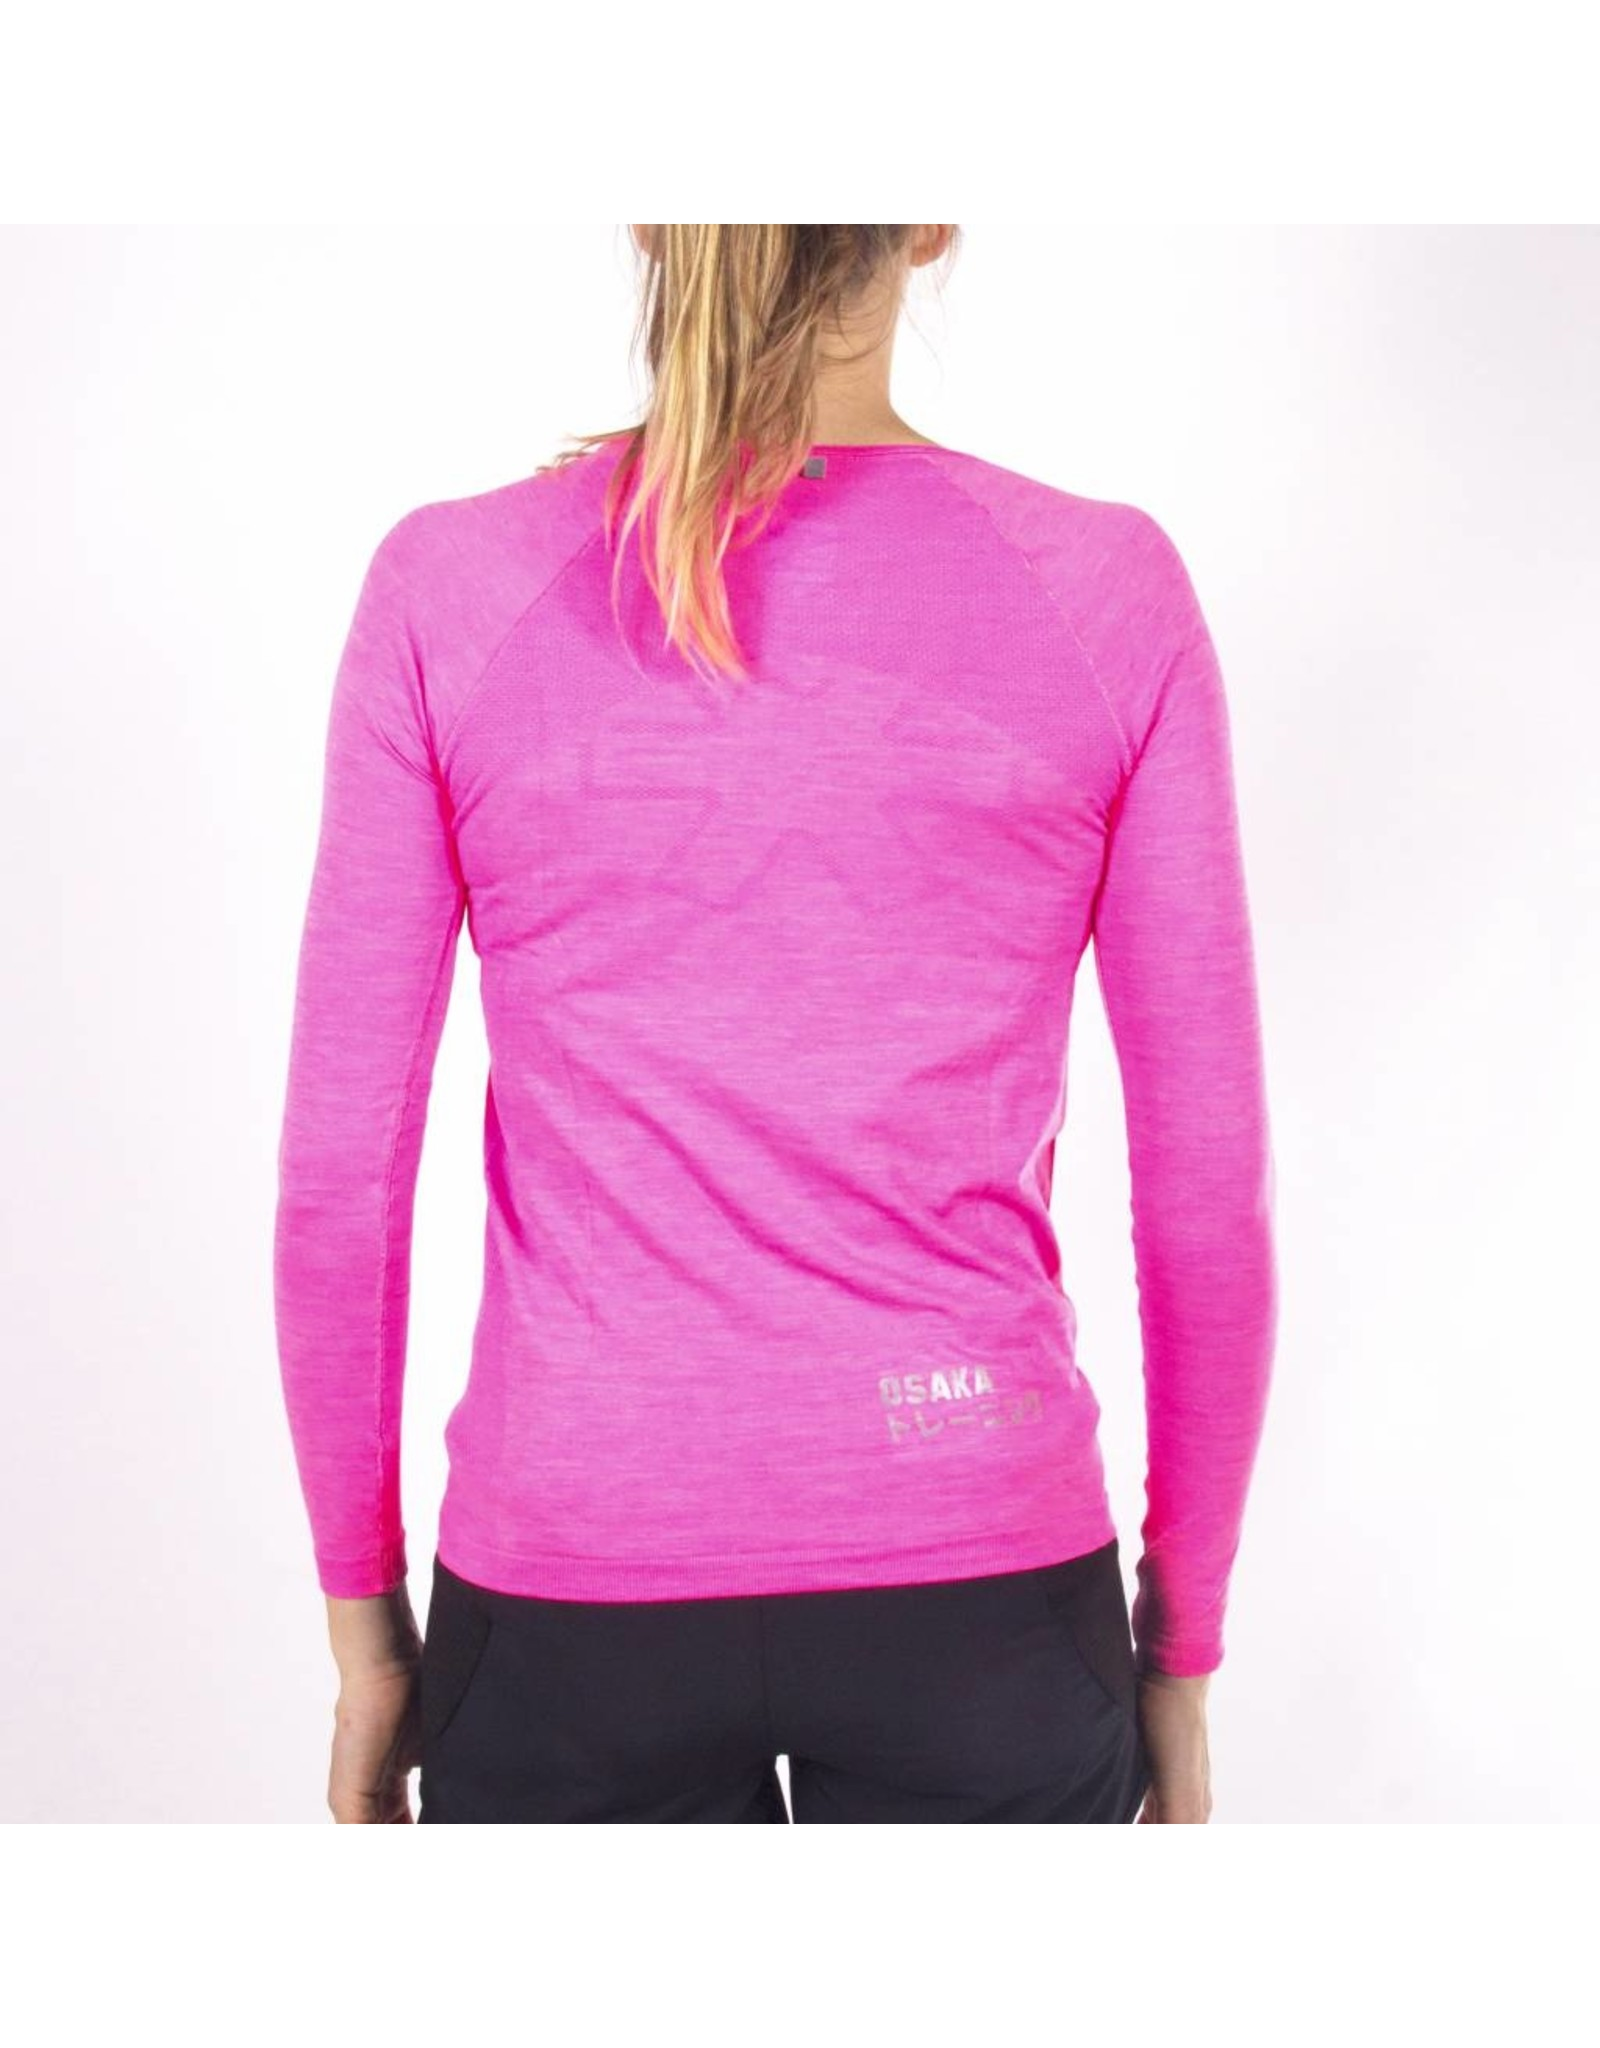 Osaka Woman Tech Knit Long Sleeve Tee - Pink/Melange